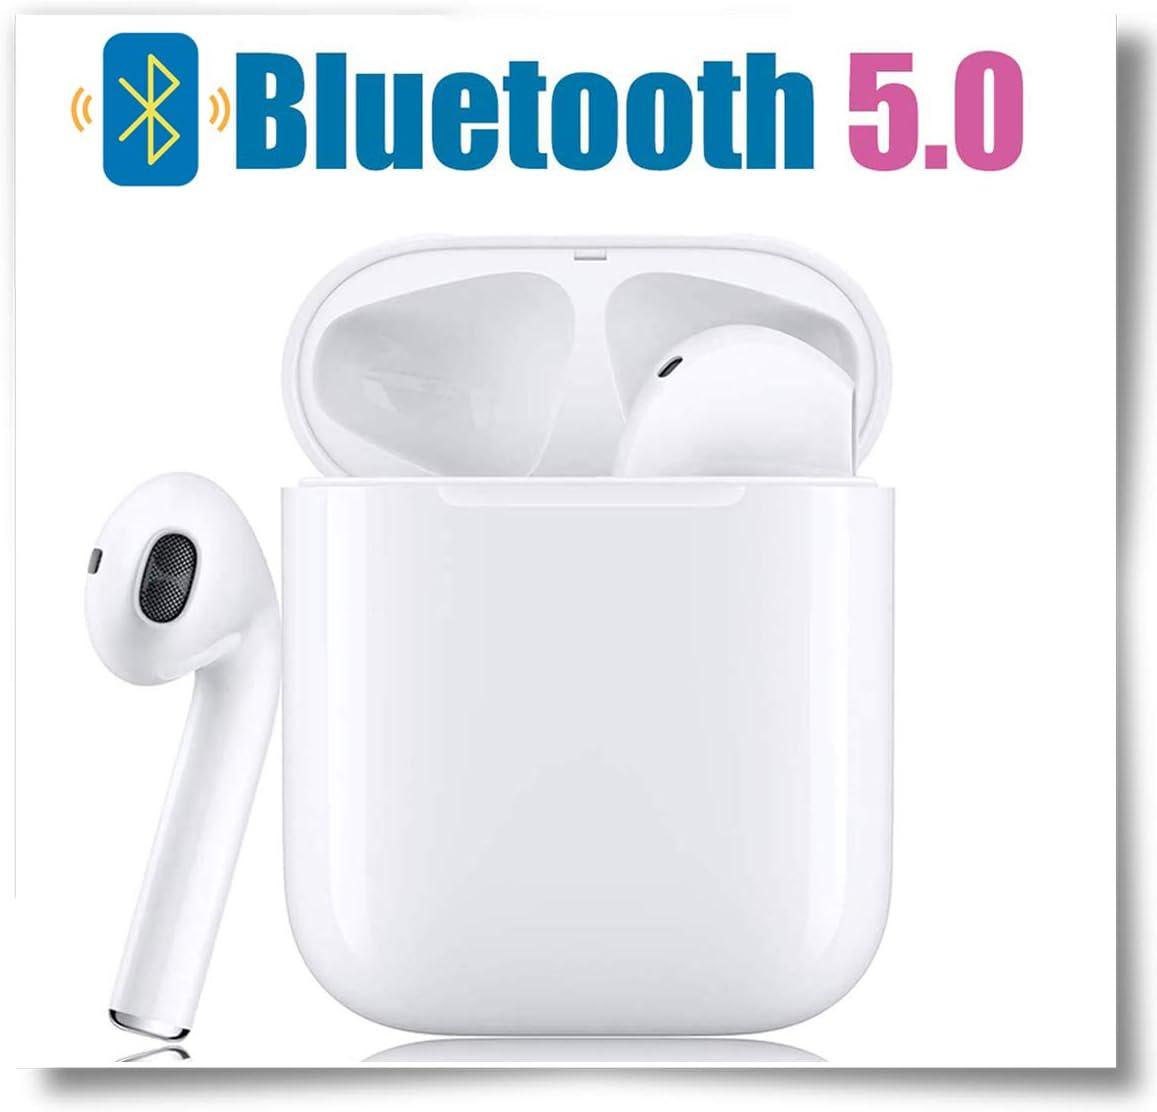 Cuffie wireless Bluetooth 5.0 con riduzione del rumore, cuffie sportive IPX5 impermeabili, cuffie stereo, cuffie ad alta definizione integrate per Android/ios